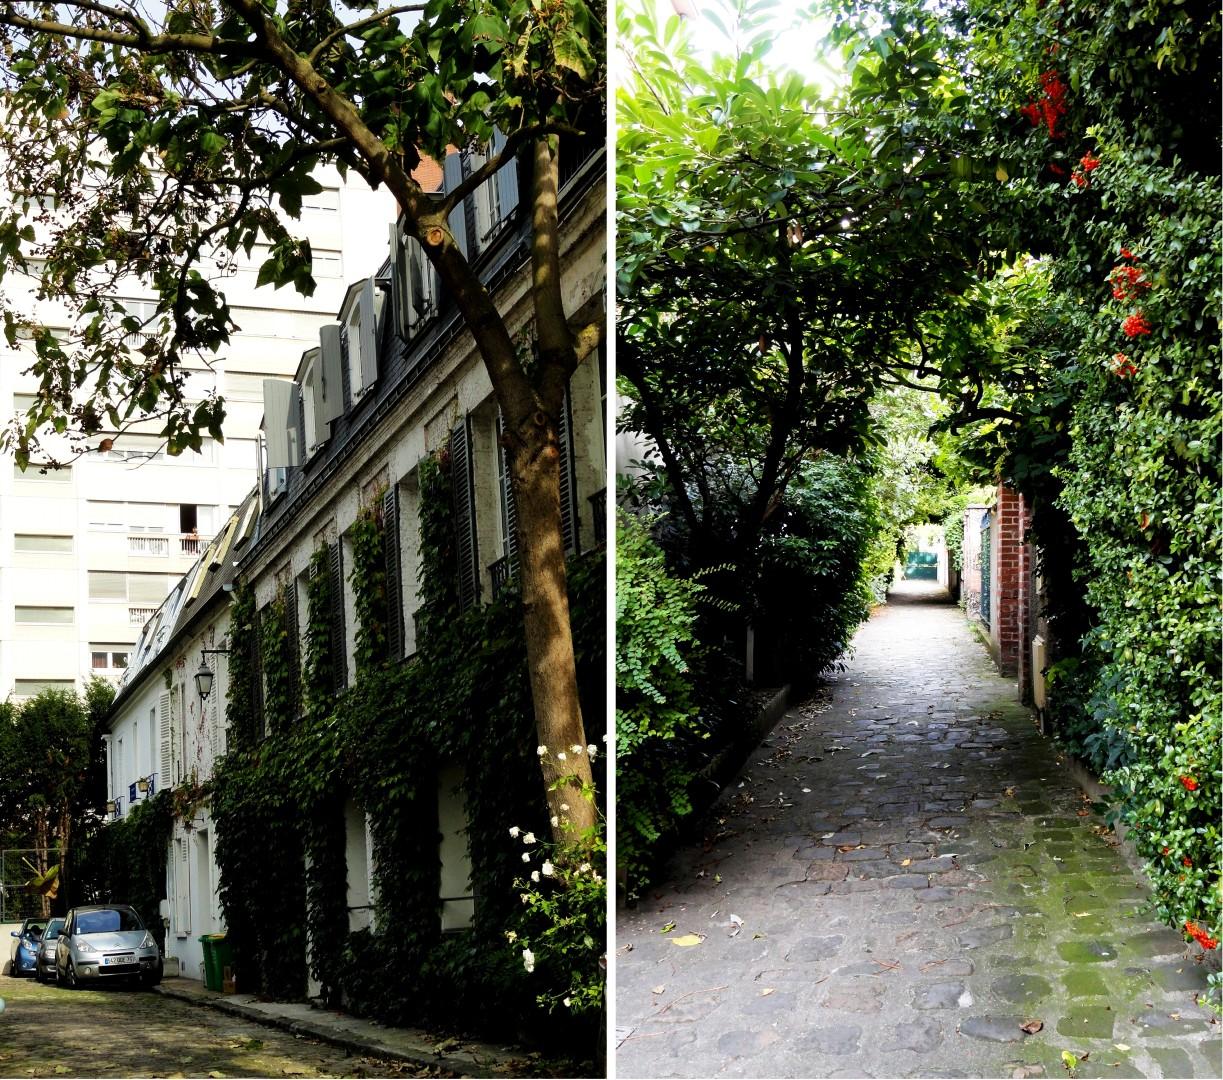 Balade dans le 15e - rue d'Alleray - Hameau d'Allerau et Villa Hersent